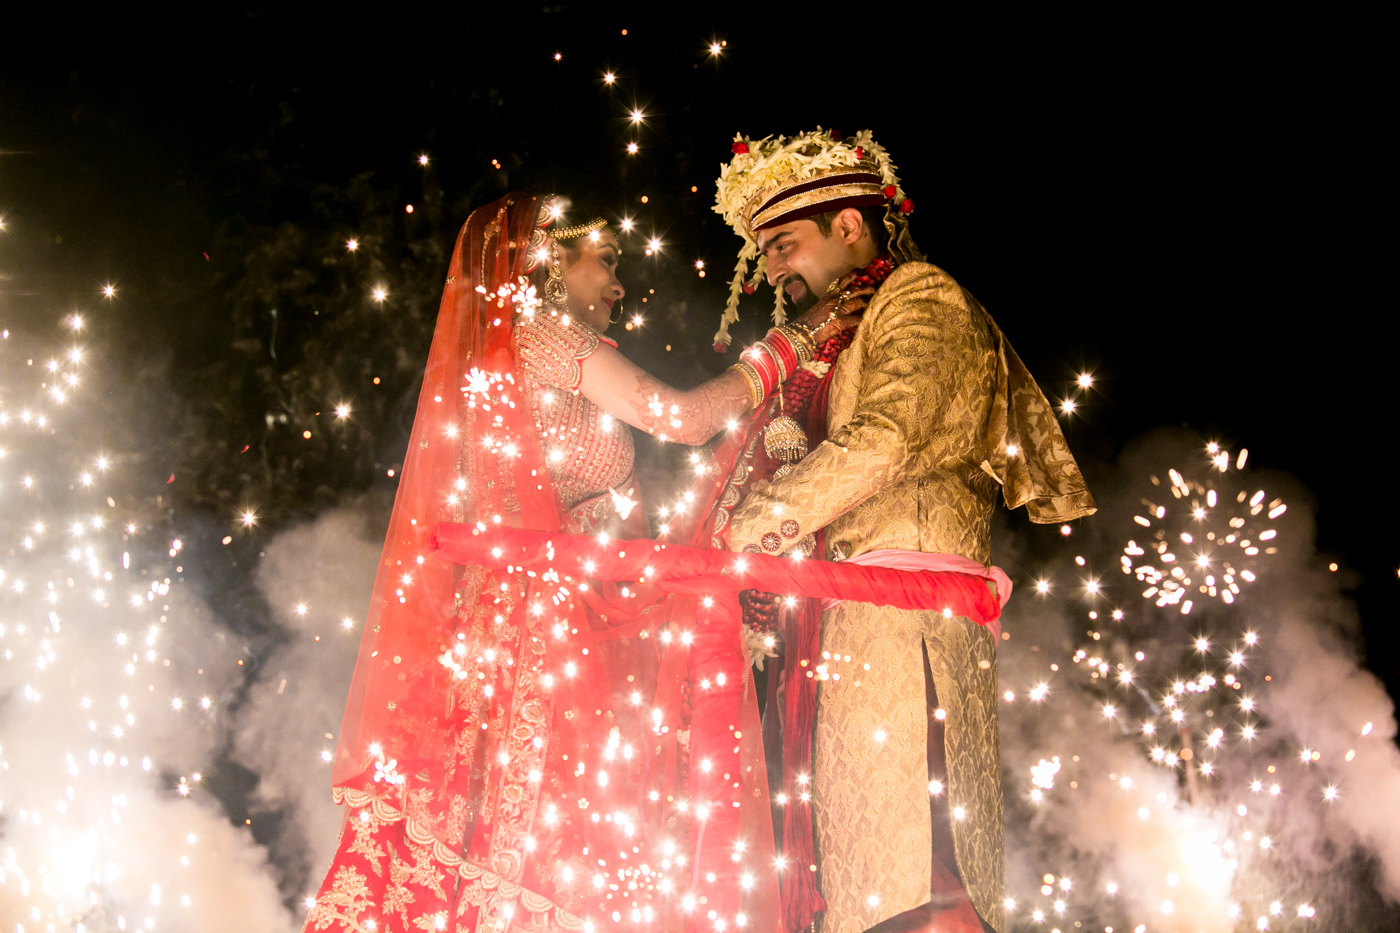 Trupti & Prateek - North Indian Wedding @ GoldFinch